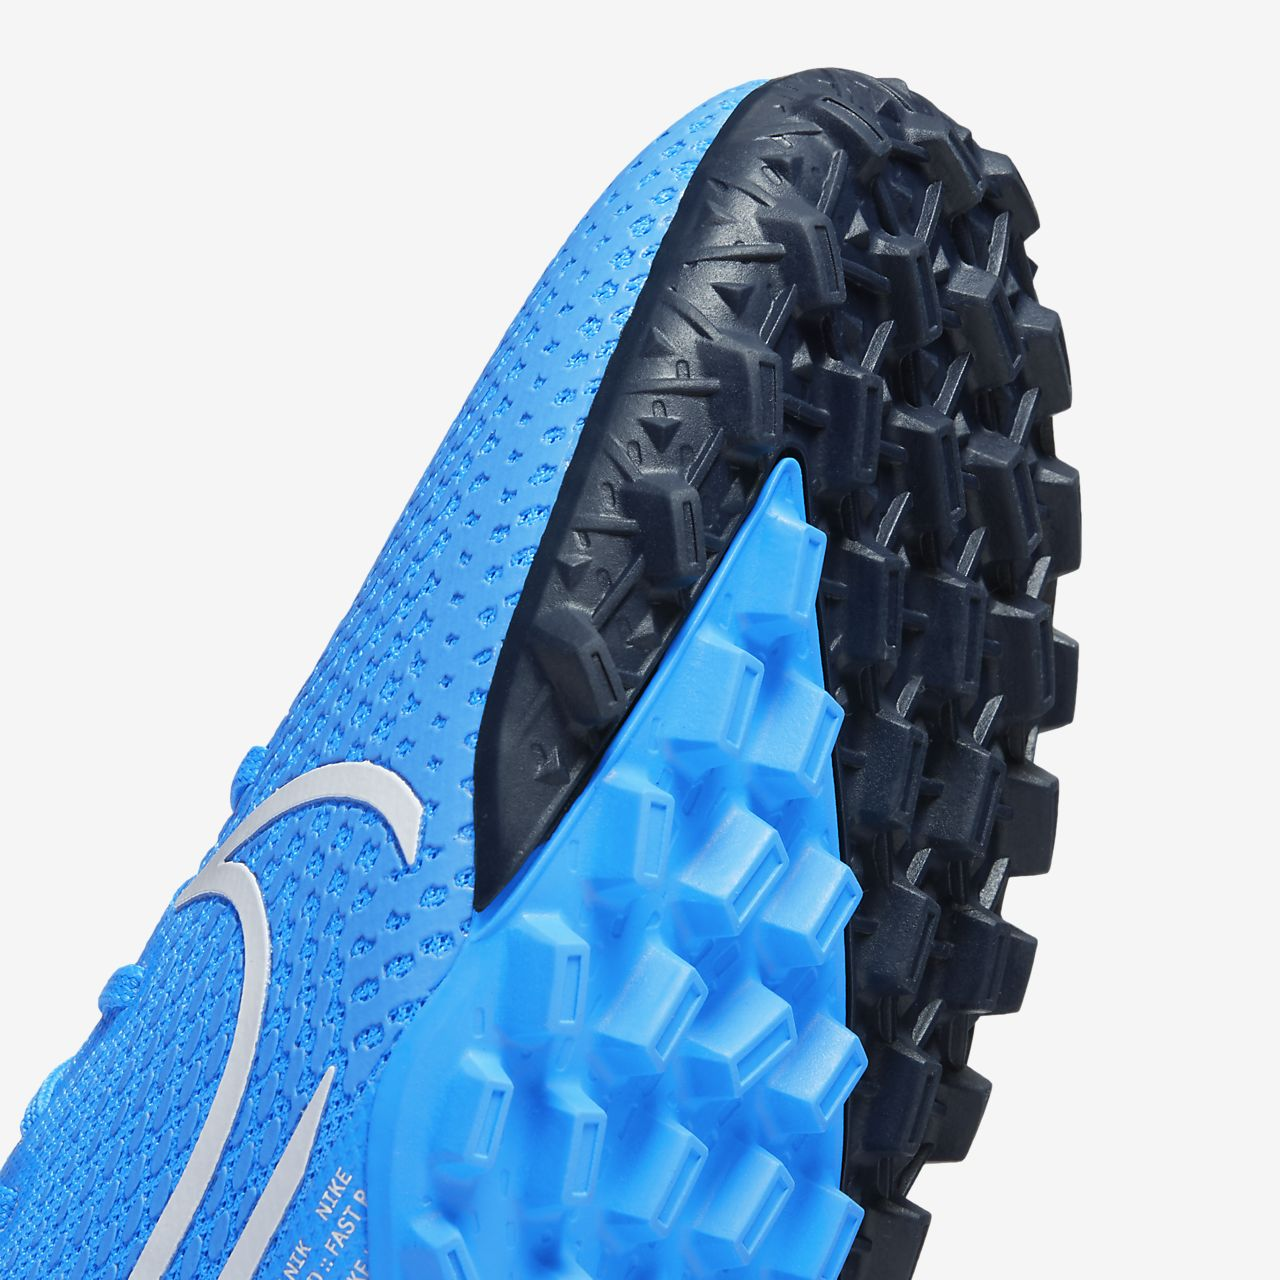 Nike Mercurial Vapor 13 Pro TF Botas de fútbol para moqueta artificial Turf